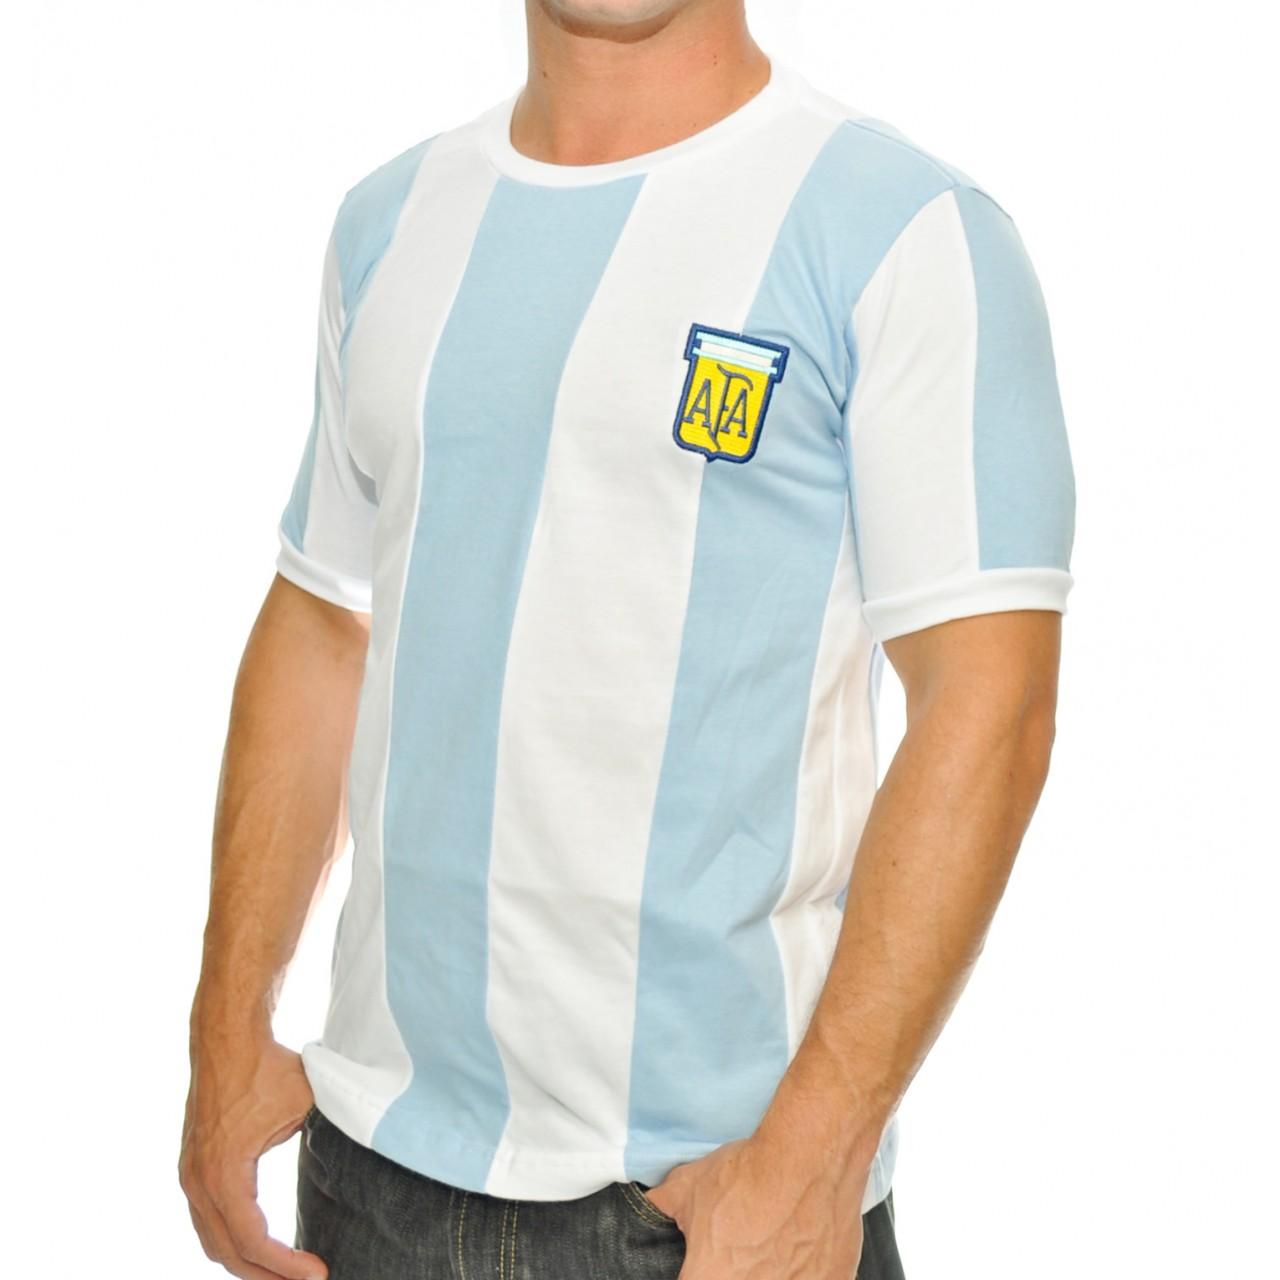 Camisa da Argentina 1978 - Camarote do Torcedor 65dd728f051